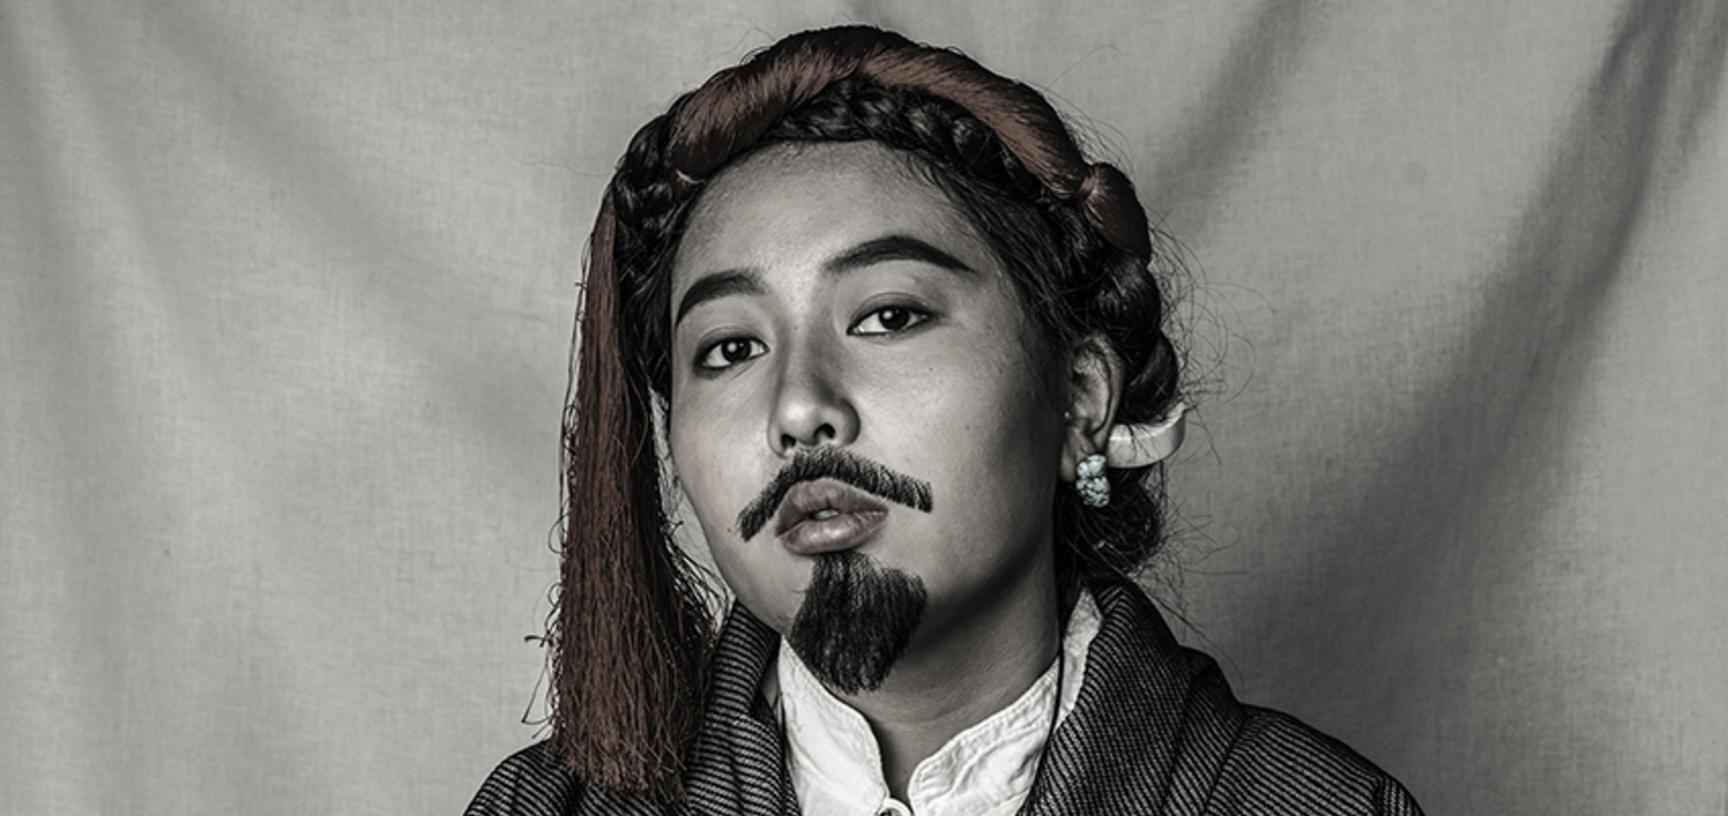 Nyema Droma self portrait, Lhasa 2018. © Nyema Droma and Pitt Rivers Museum